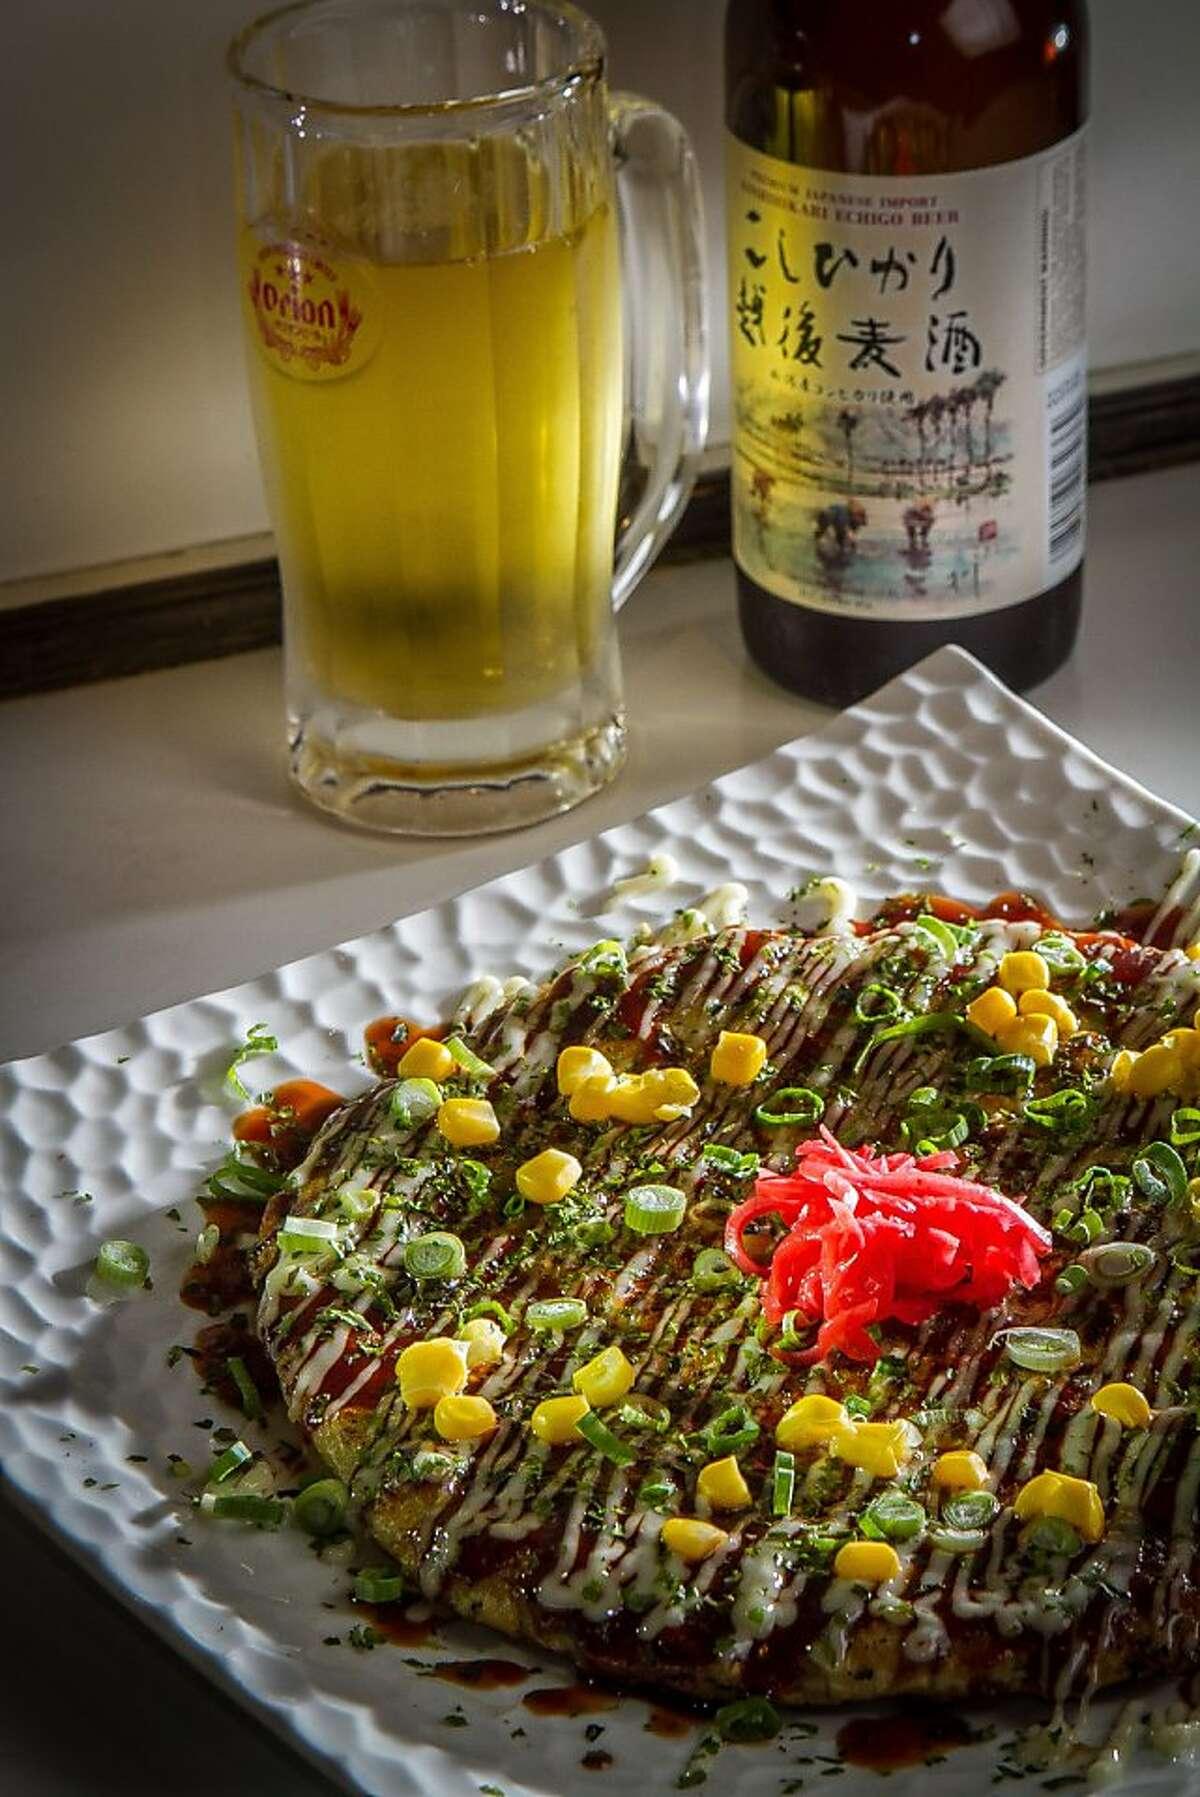 The Okonomiyaki pancake with a beer at Halu restaurant in San Francisco, Calif., is seen on Saturday, January 5th, 2013.